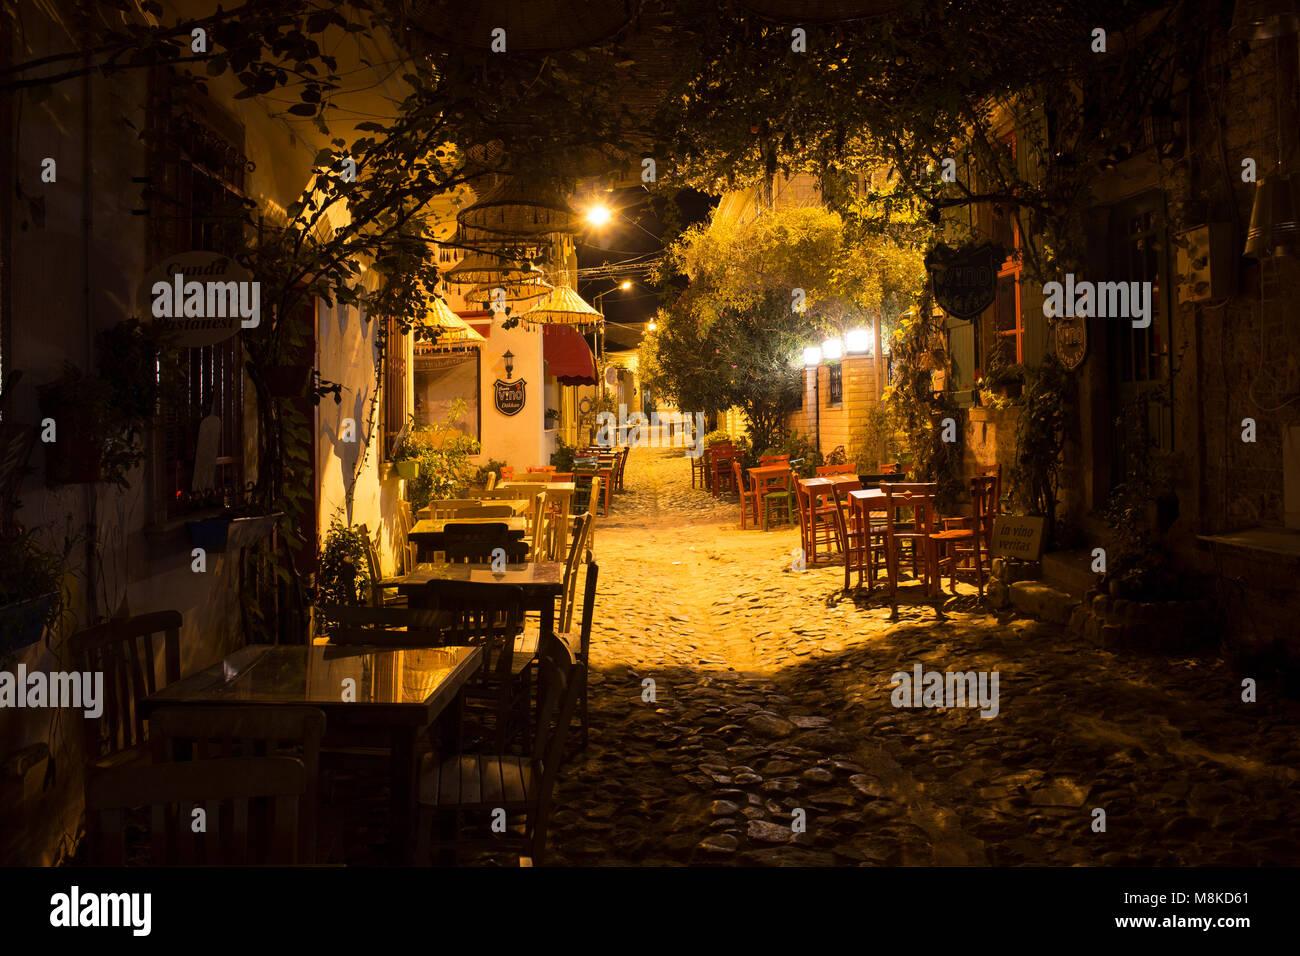 Night view of a street in Cunda island in Turkey - Stock Image